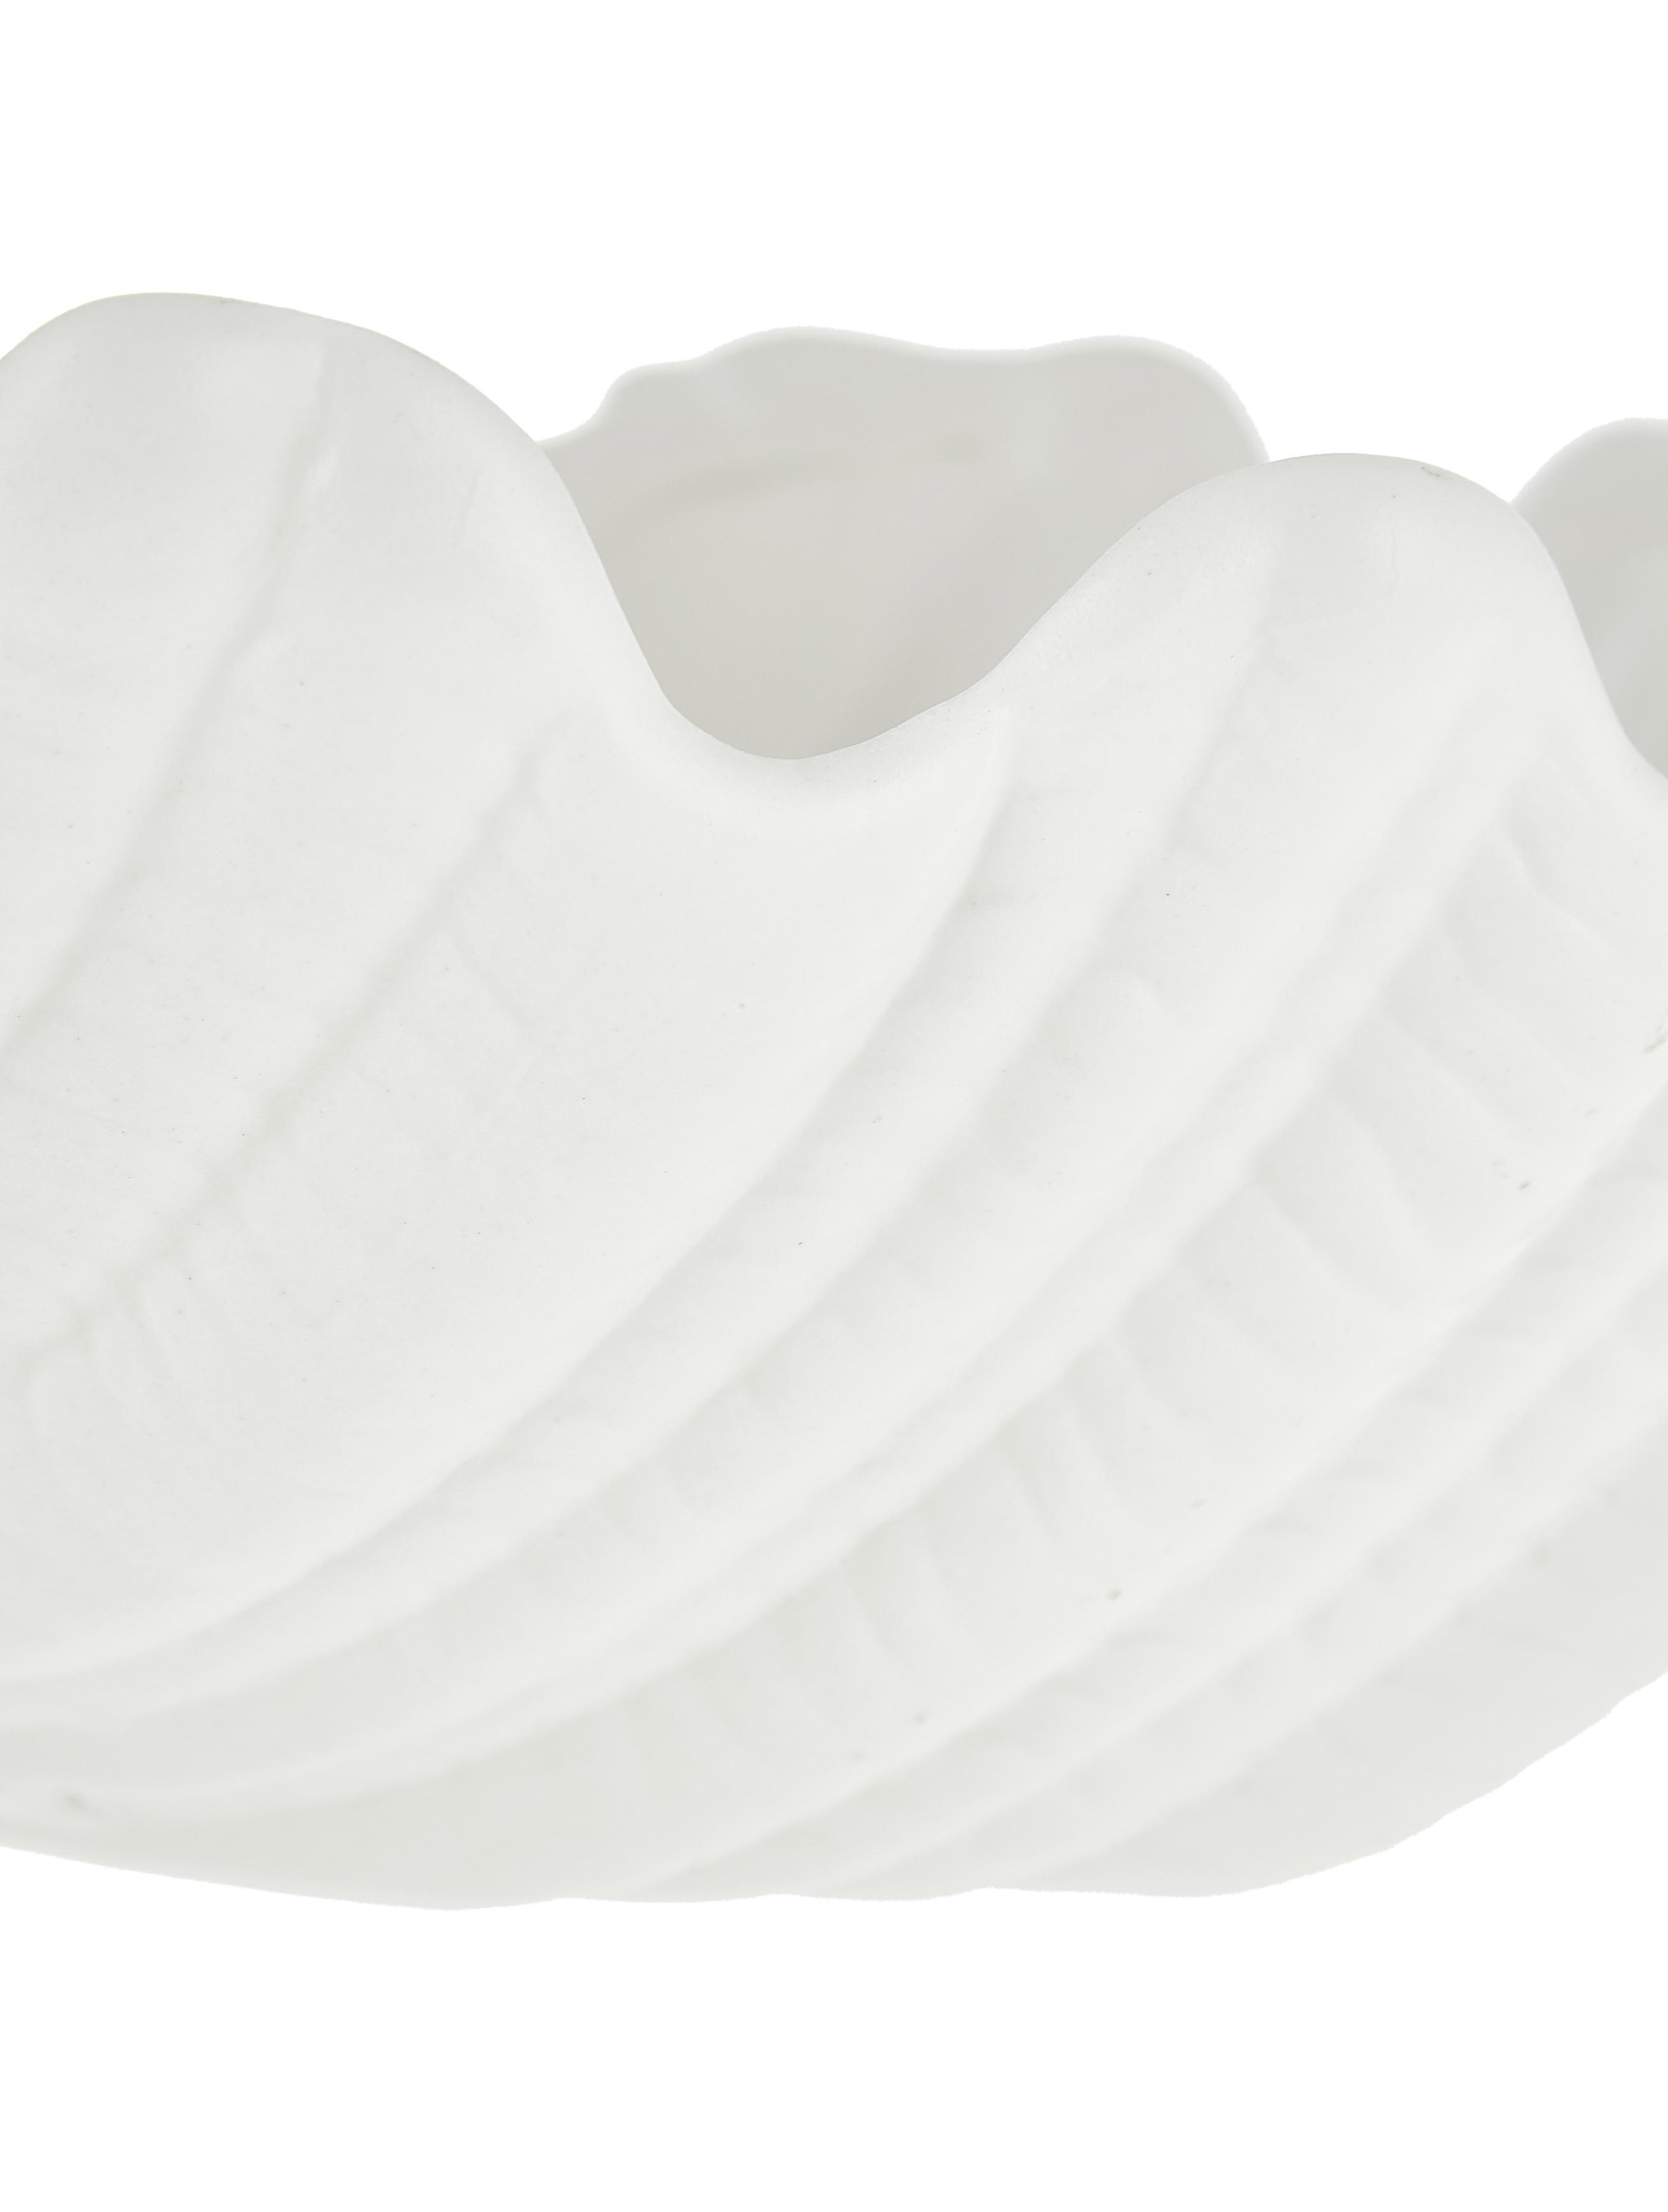 Schaal Shell, Keramiek, Wit, Ø 34 x H 9 cm